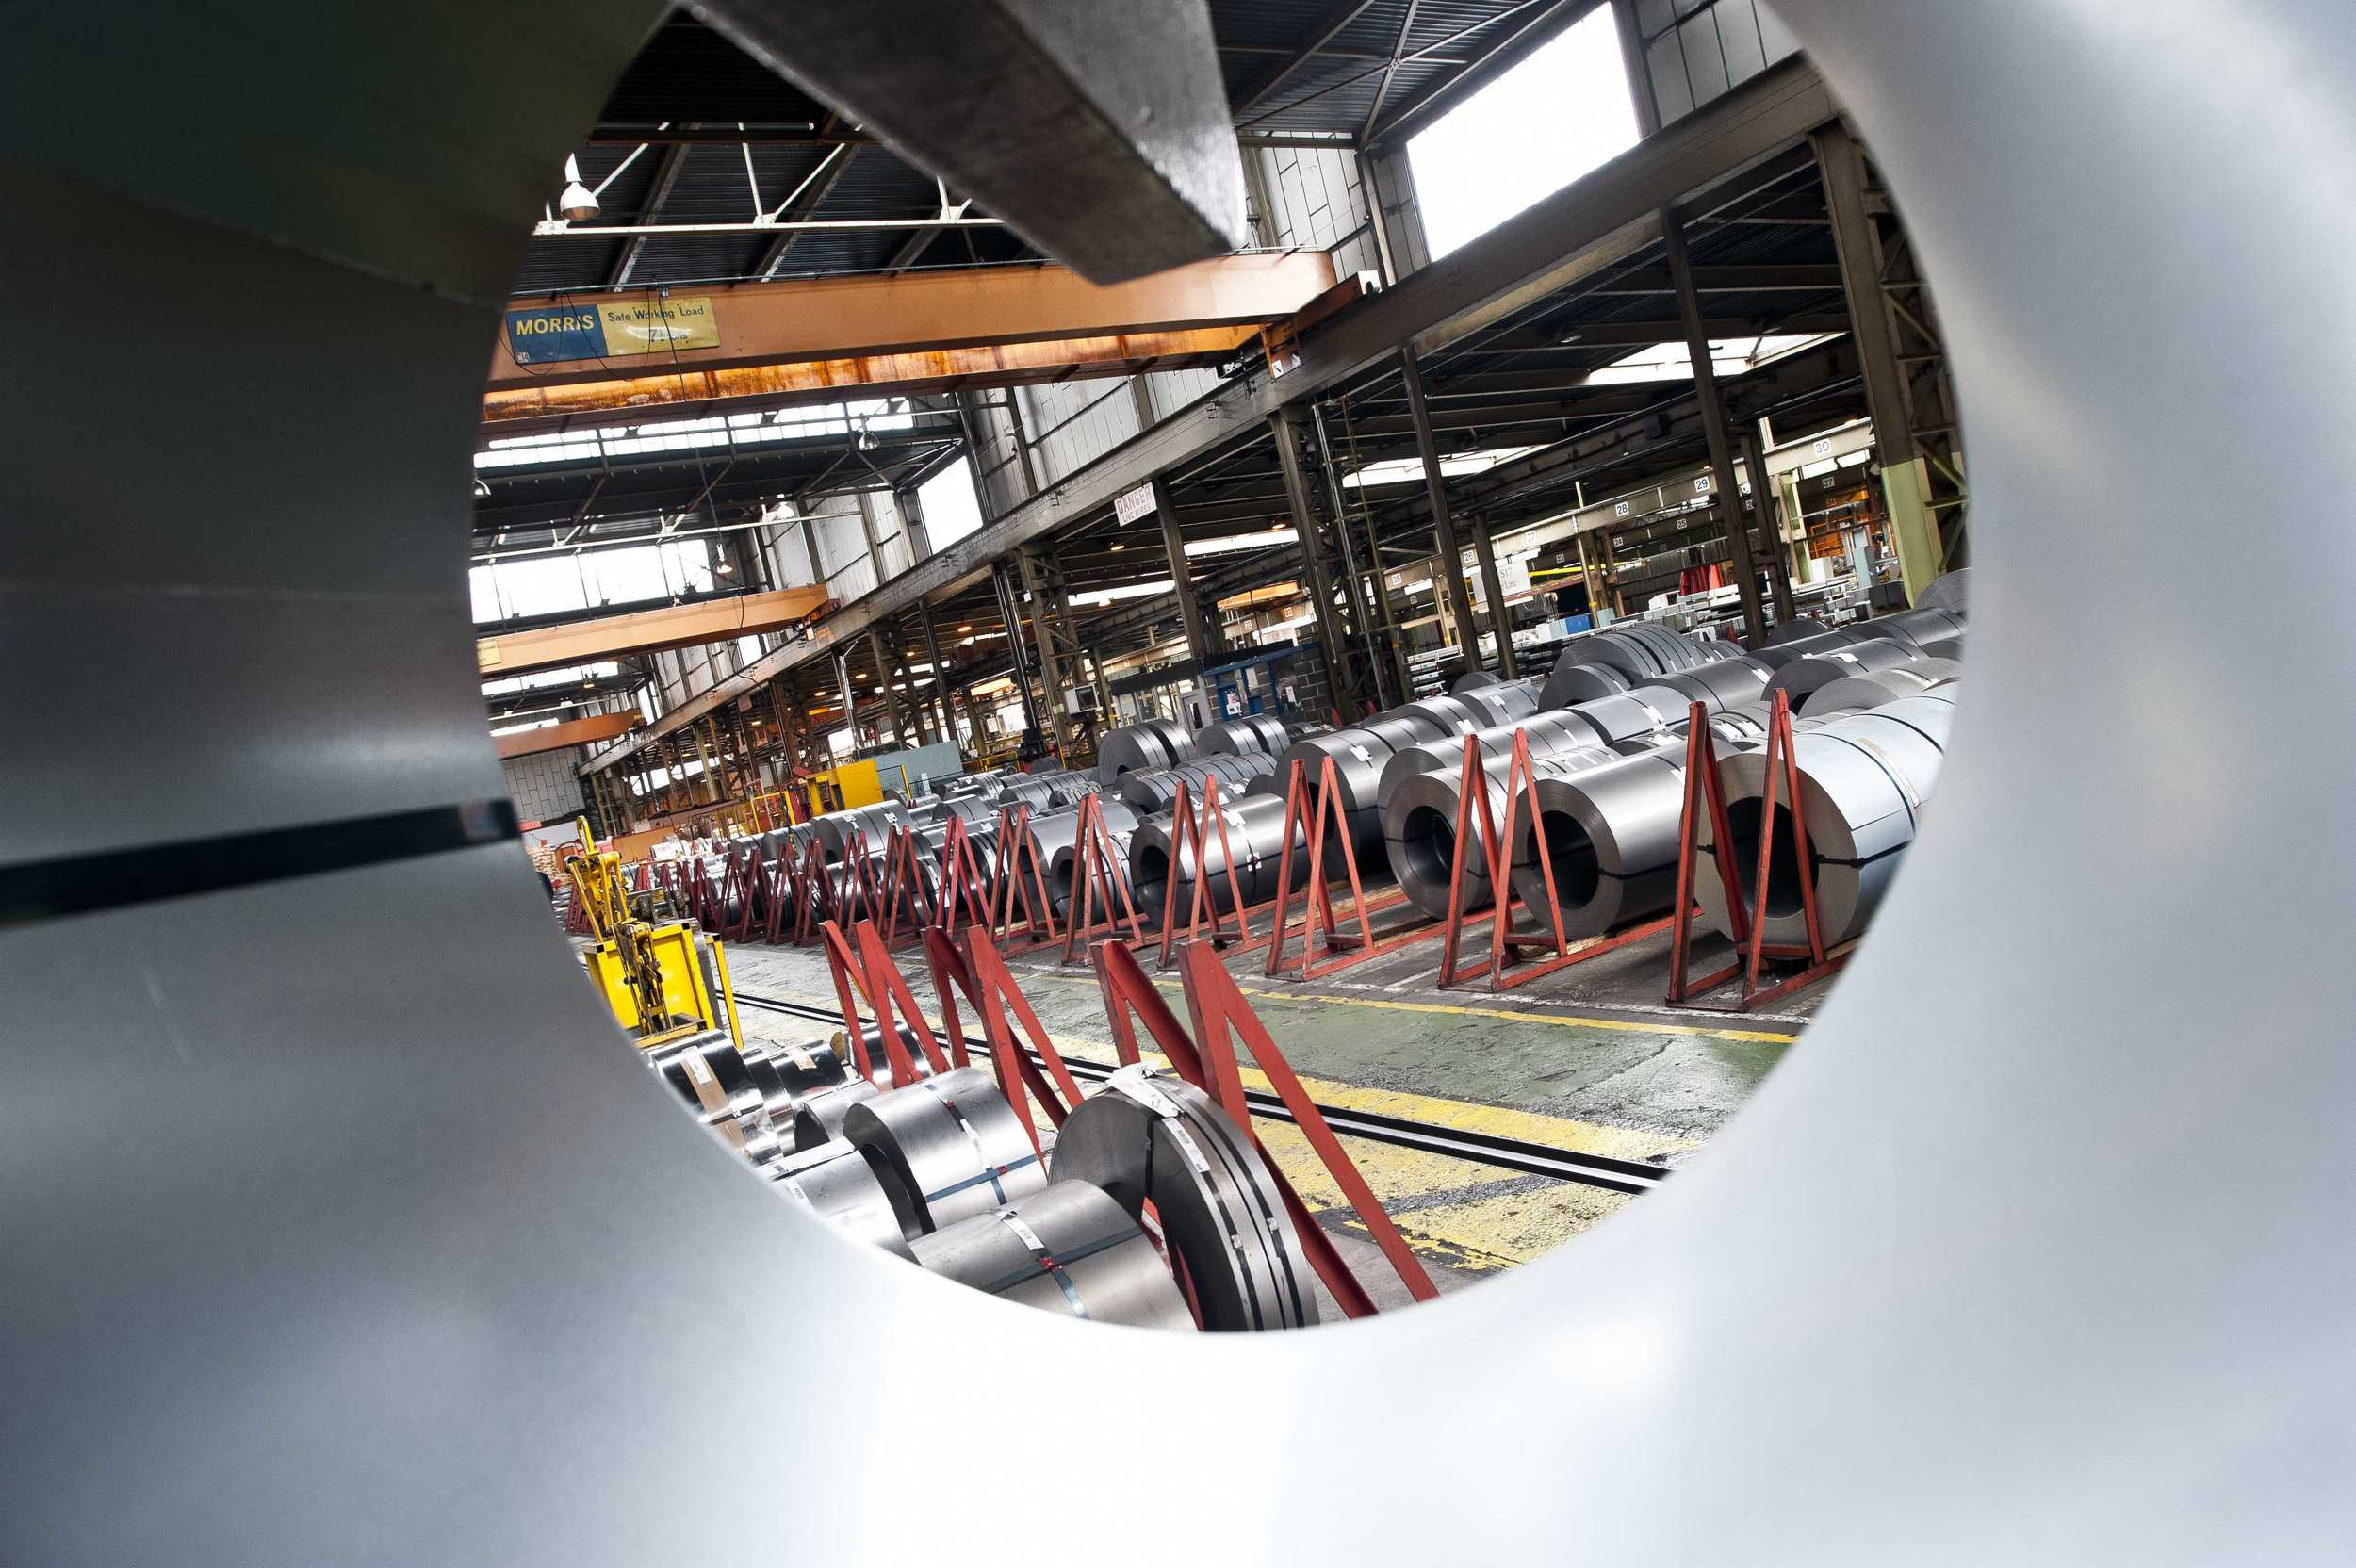 dennisdavisphotography_industrial_steel Manufacture.jpg